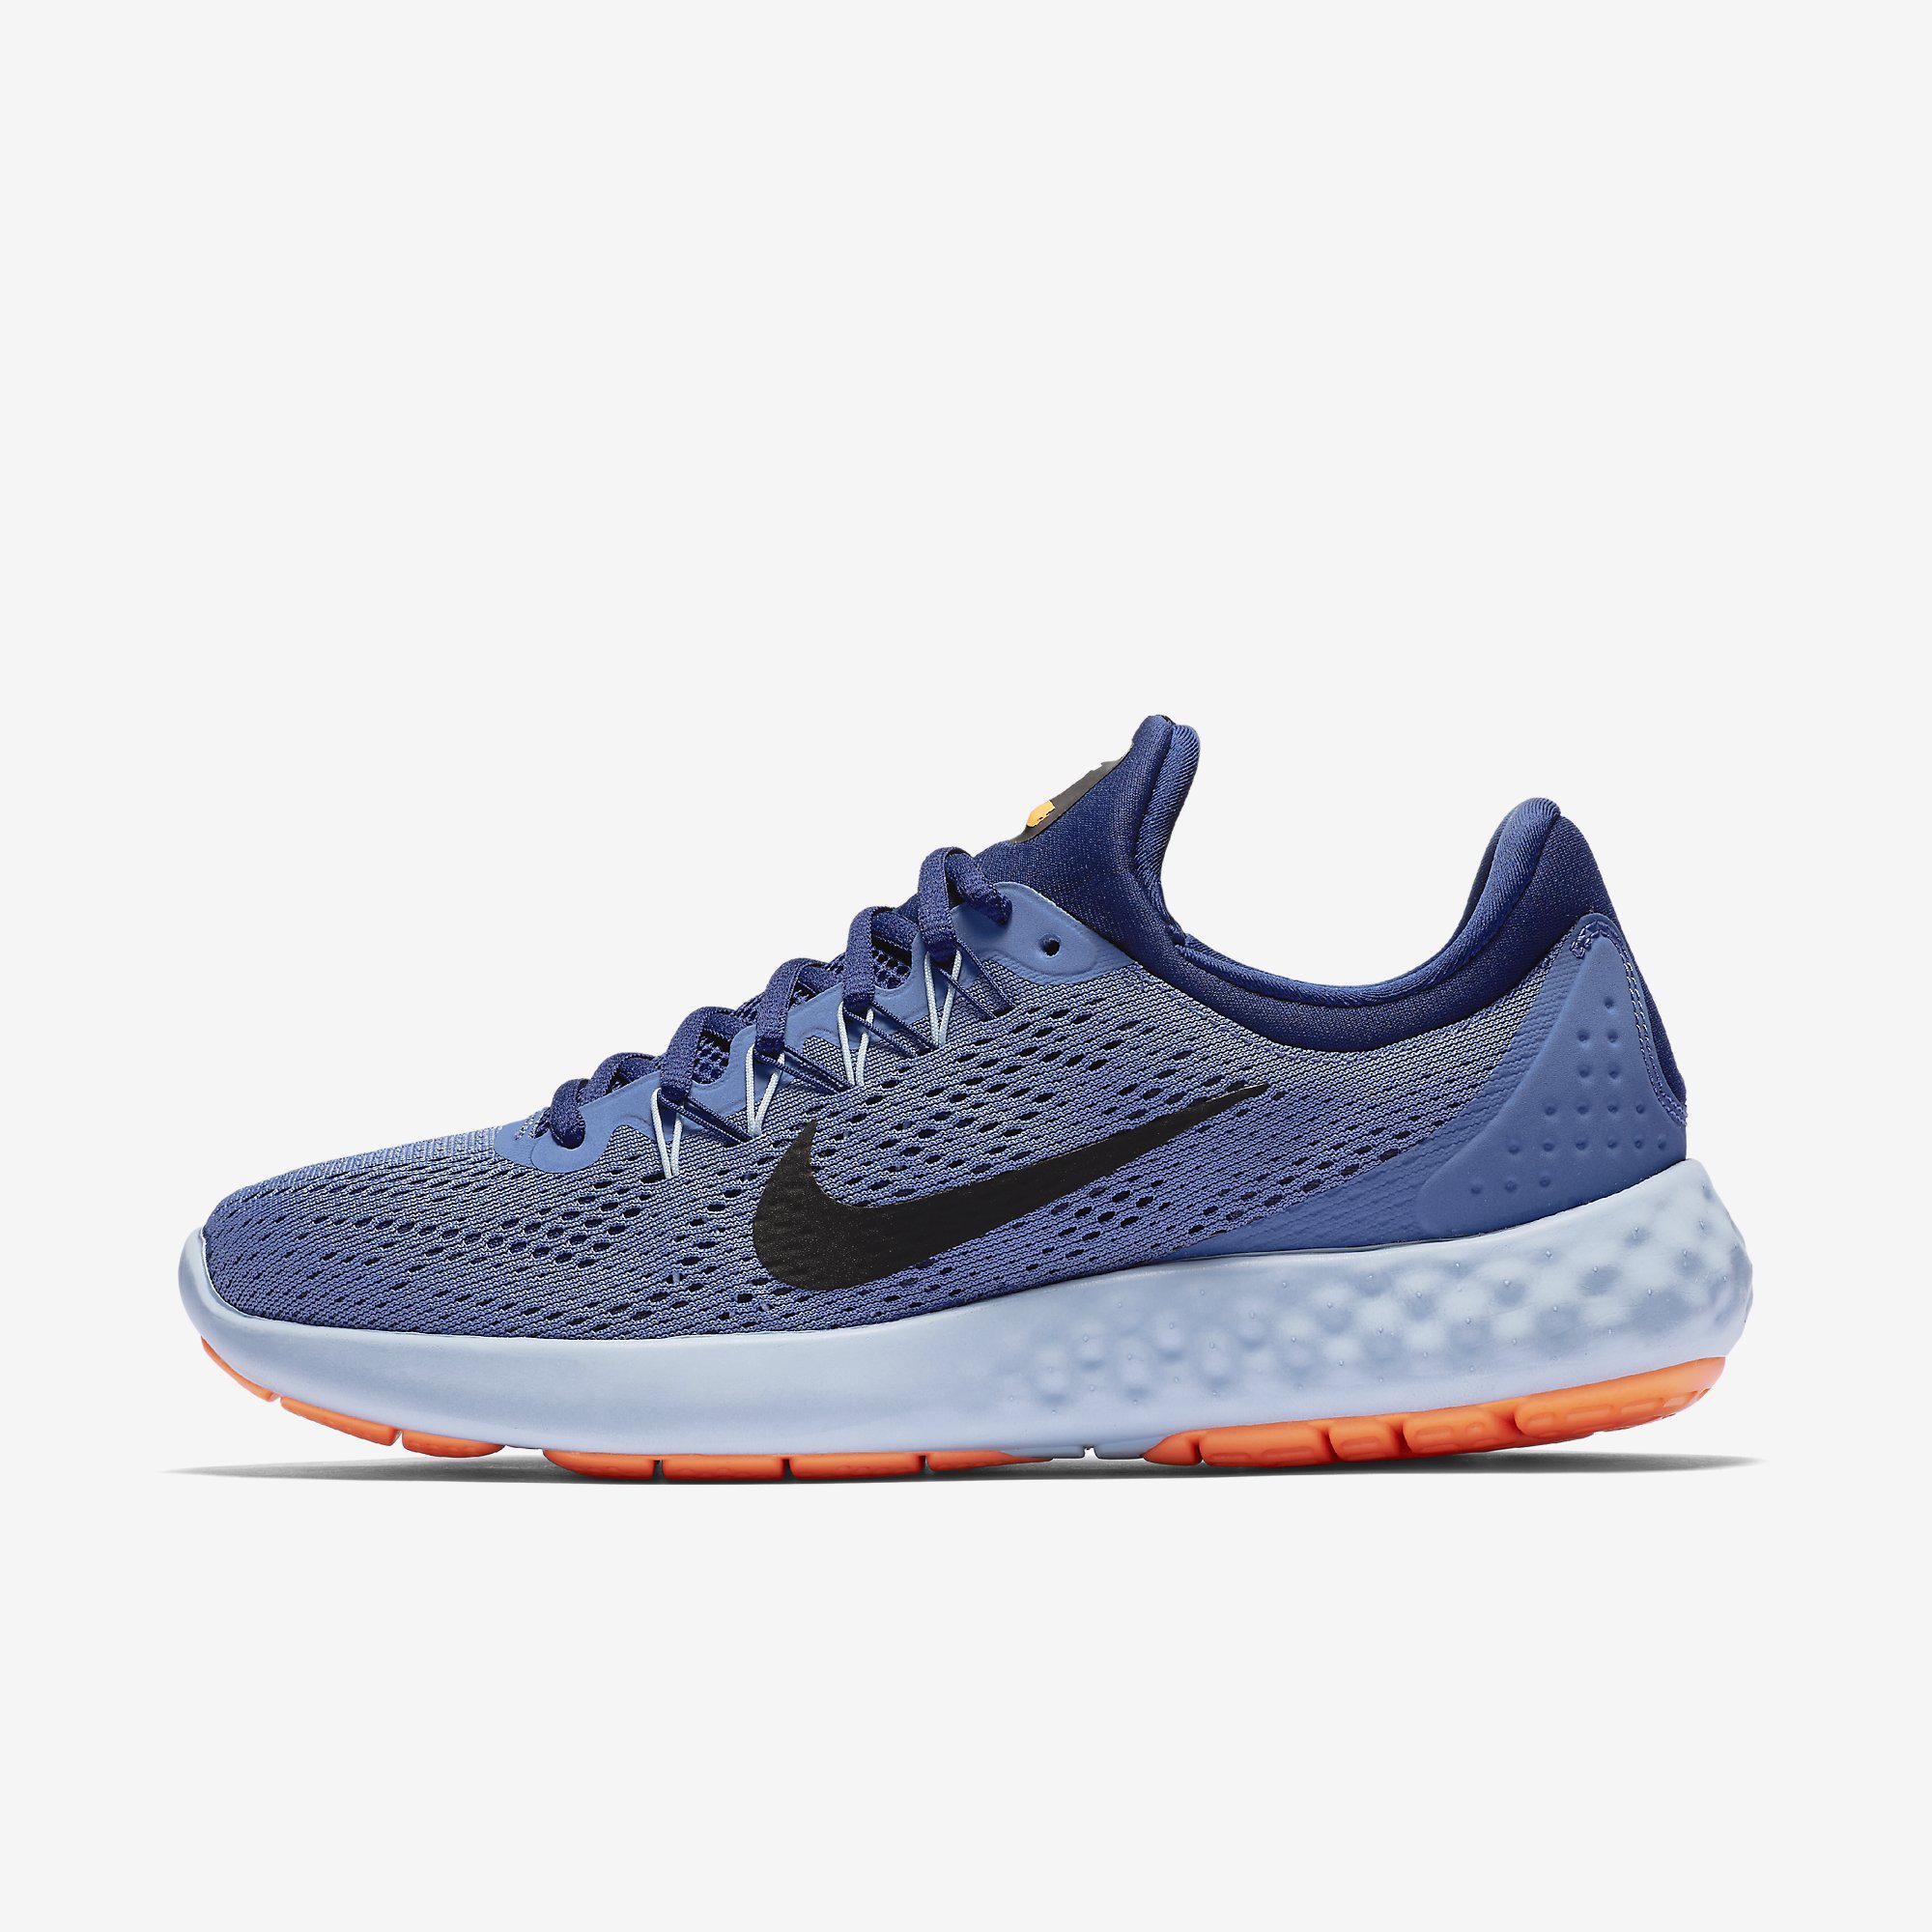 2097ece3d98f Nike Mens Lunar Skyelux Running Shoes - Blue Moon - Tennisnuts.com